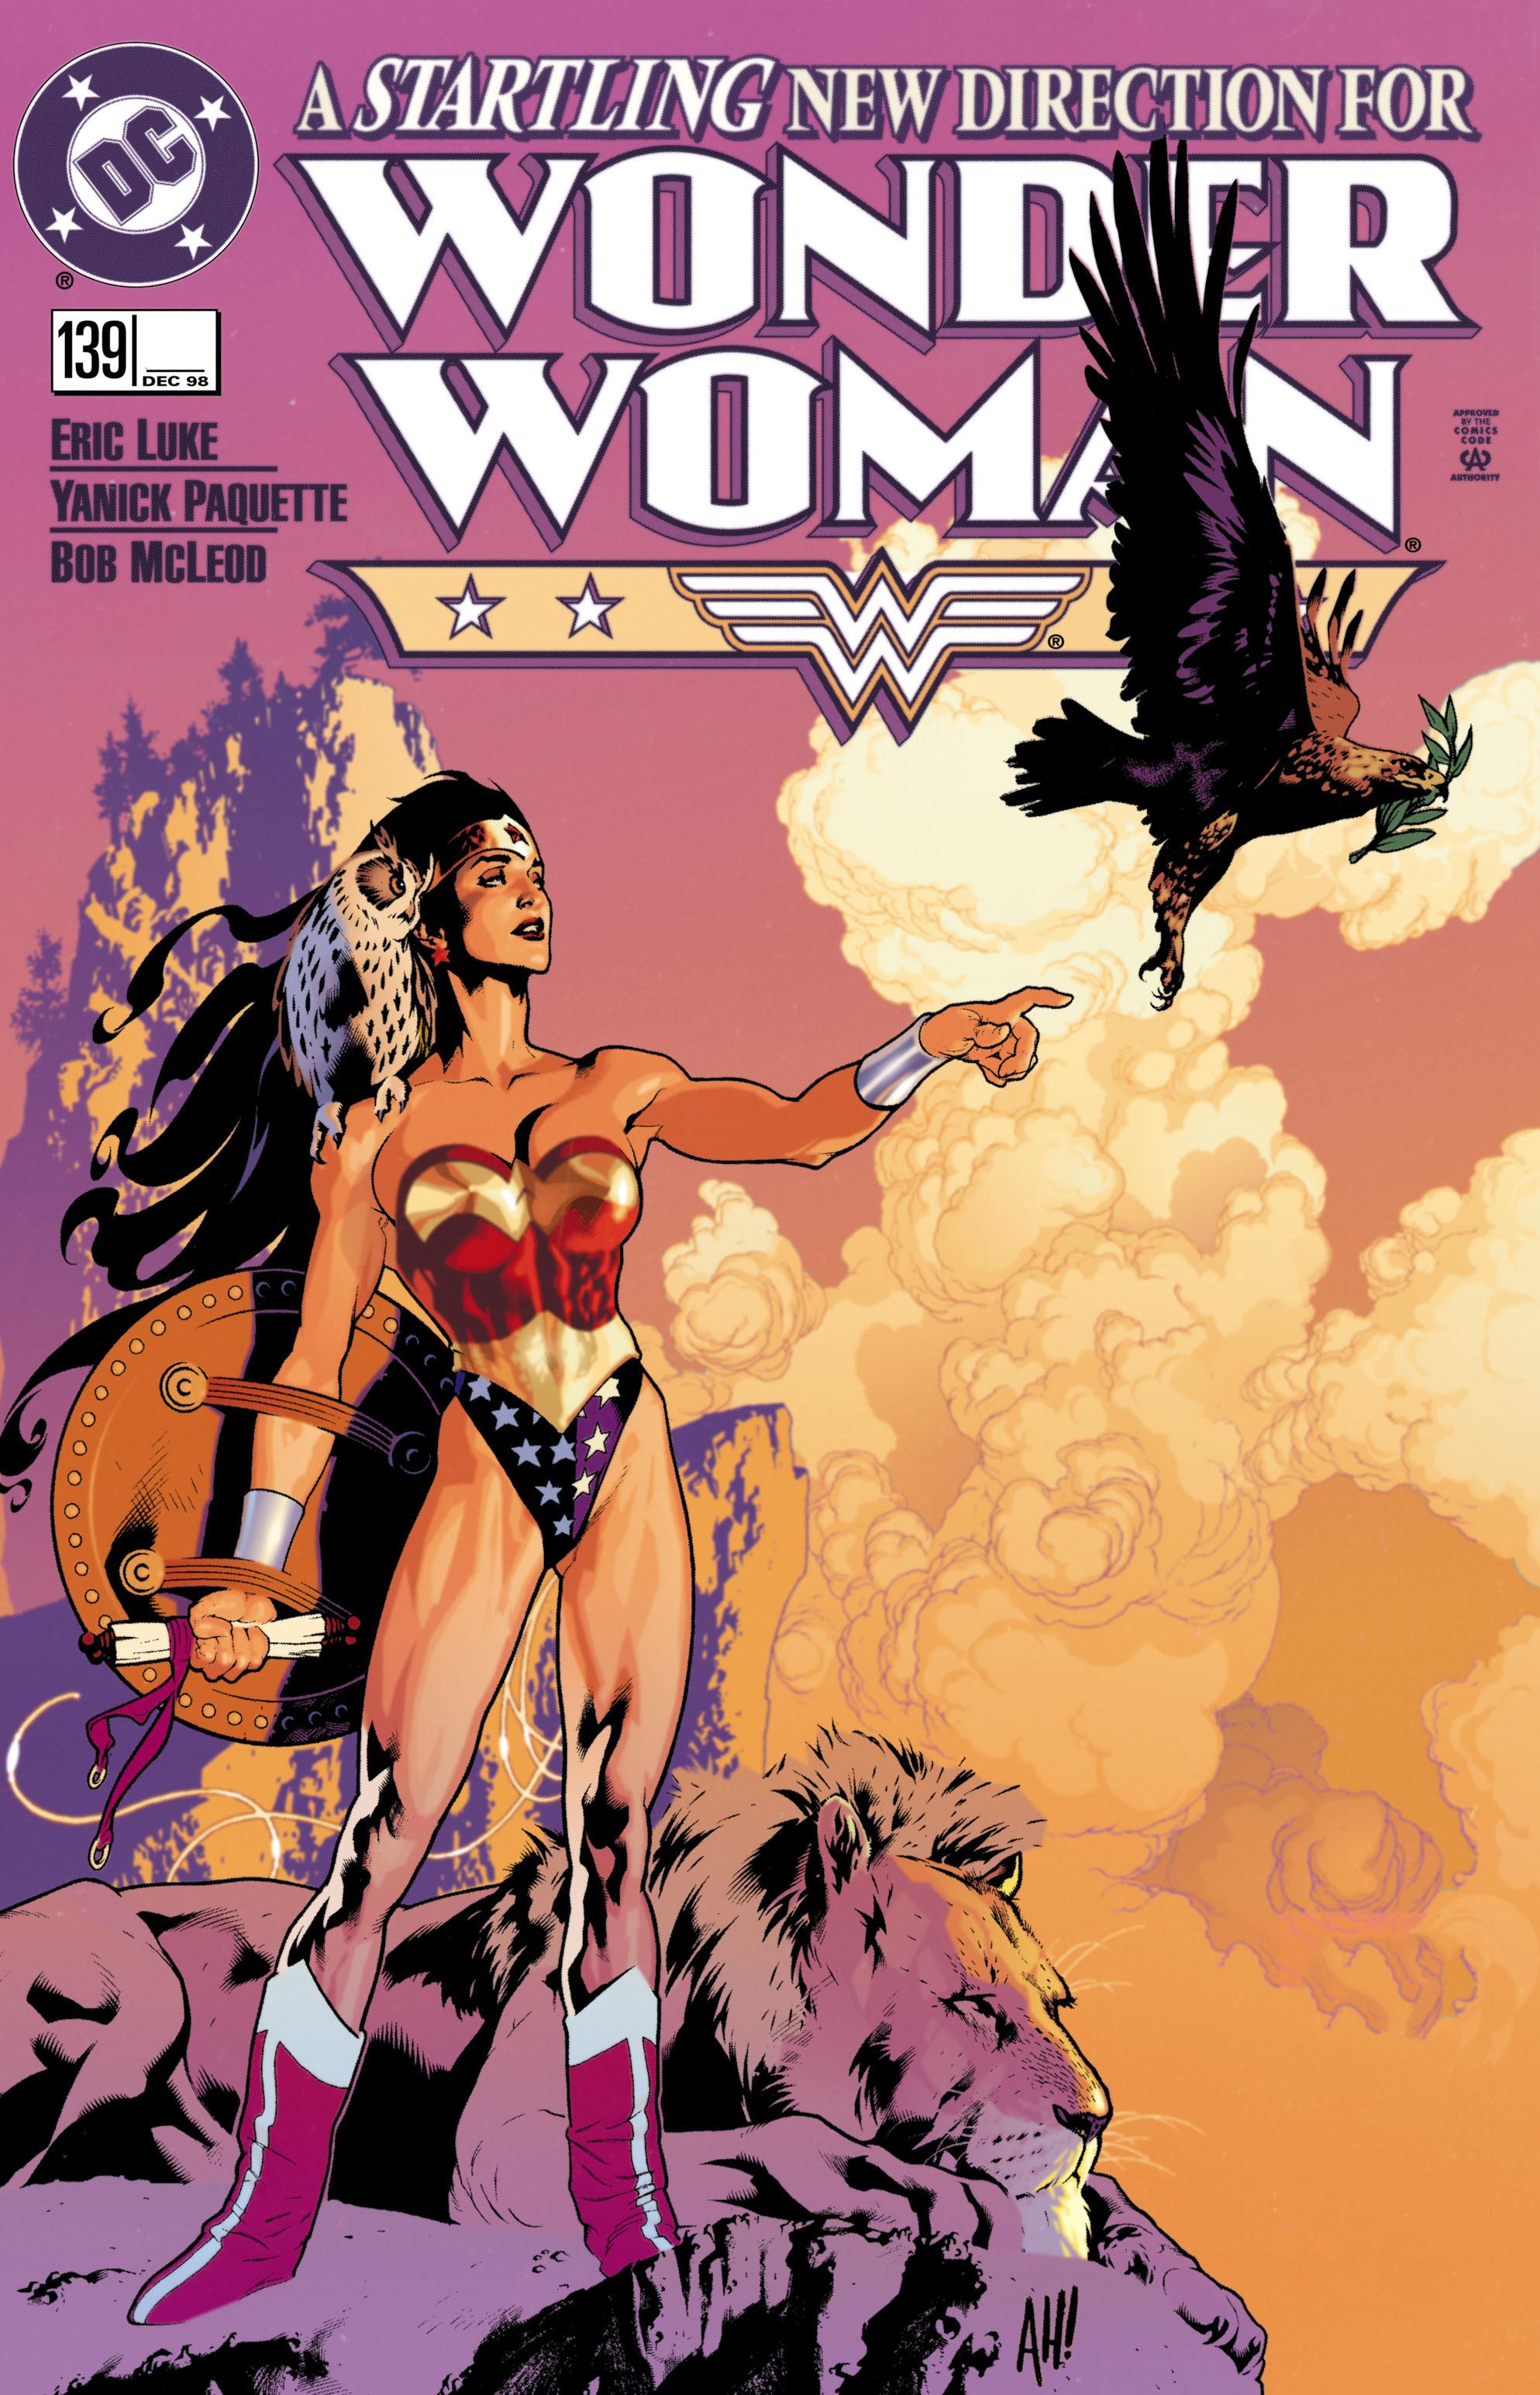 Read online Wonder Woman (1987) comic -  Issue #139 - 1